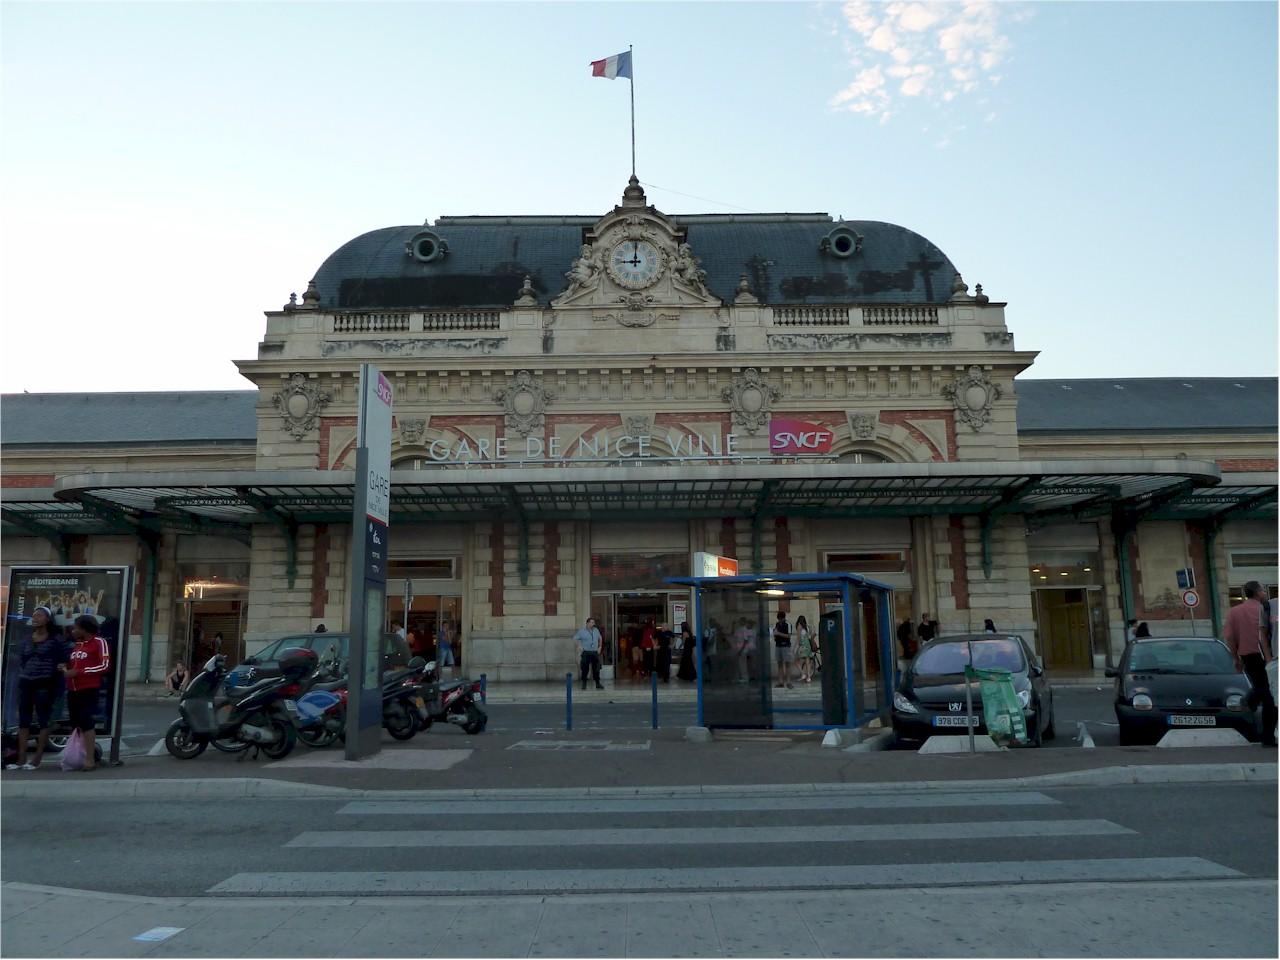 Nice-Ville-train-station